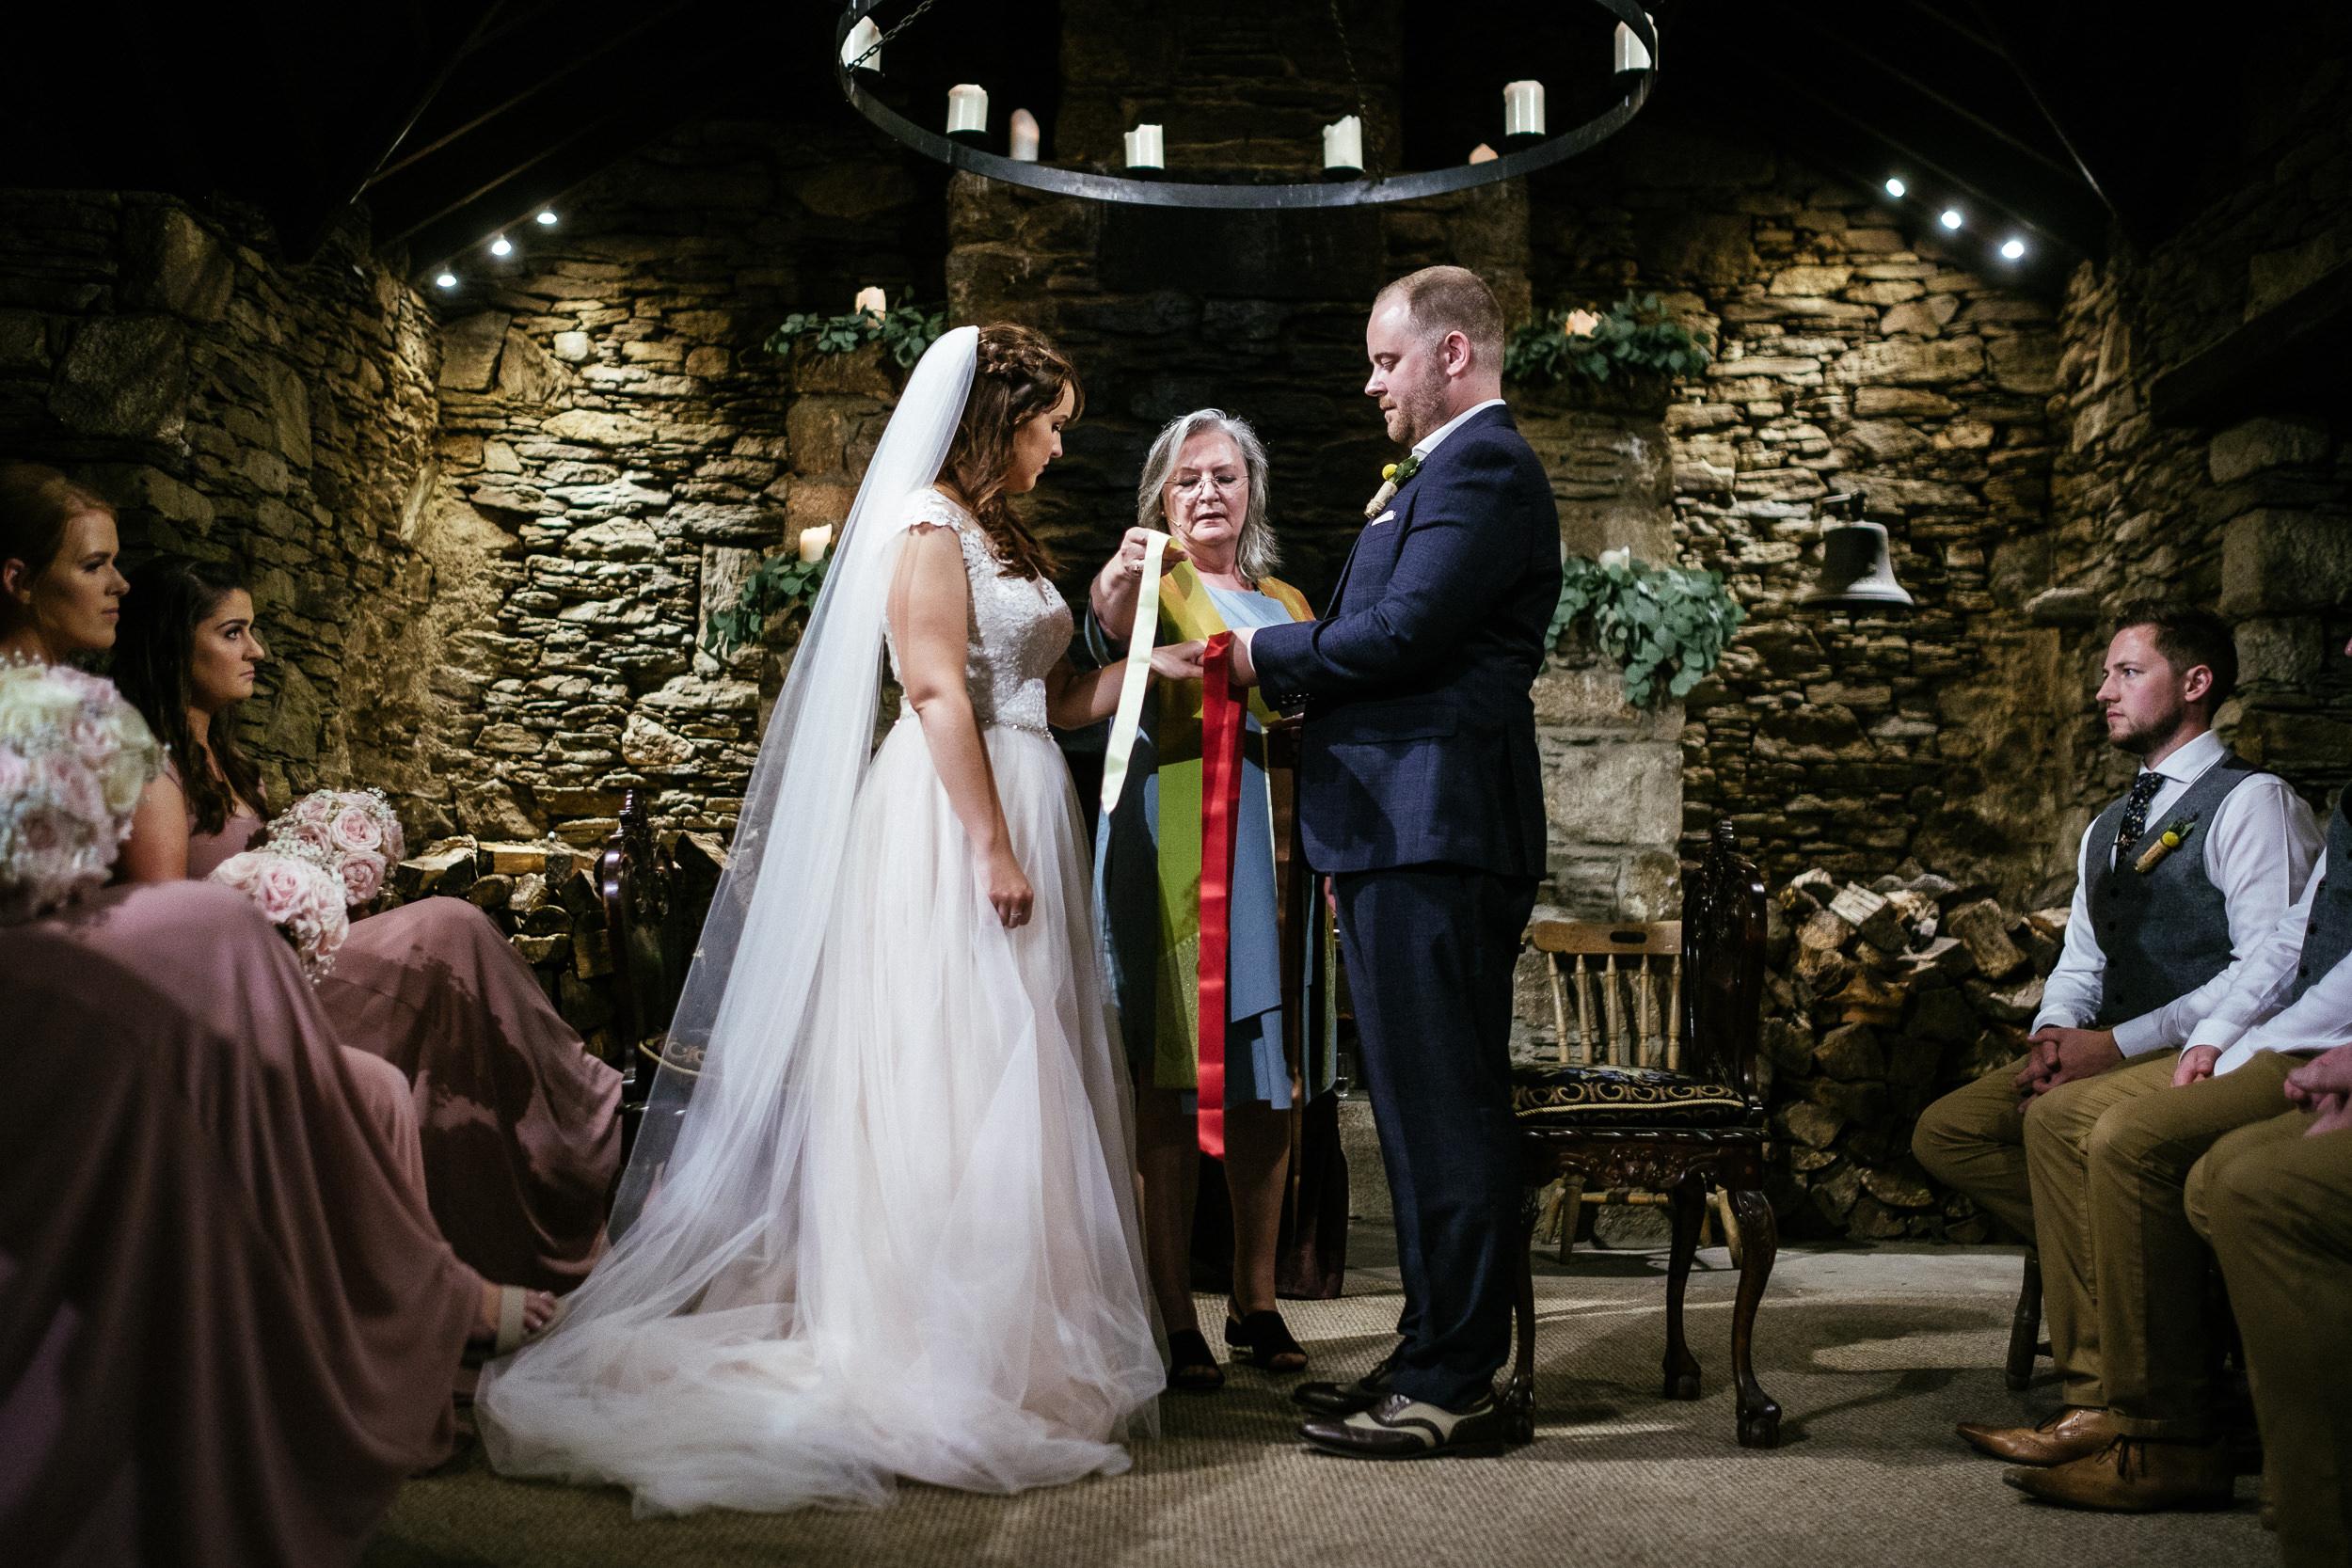 handfastening at ballybeg house wedding